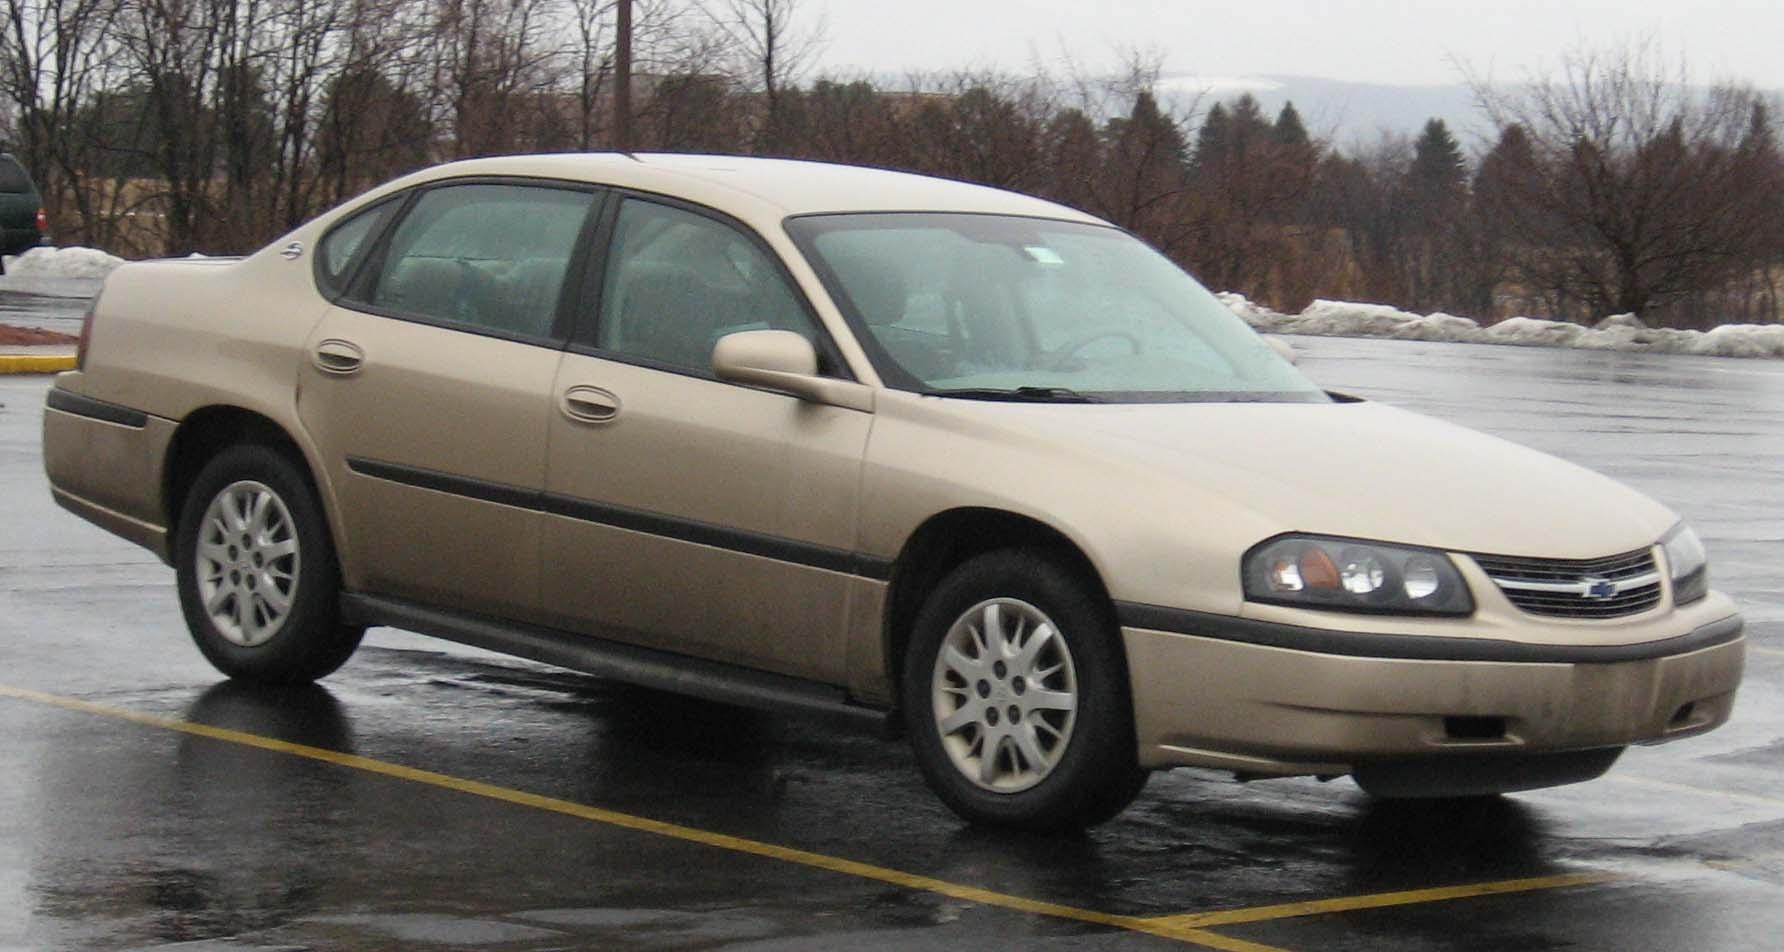 File:00 05 Chevrolet Impala LS